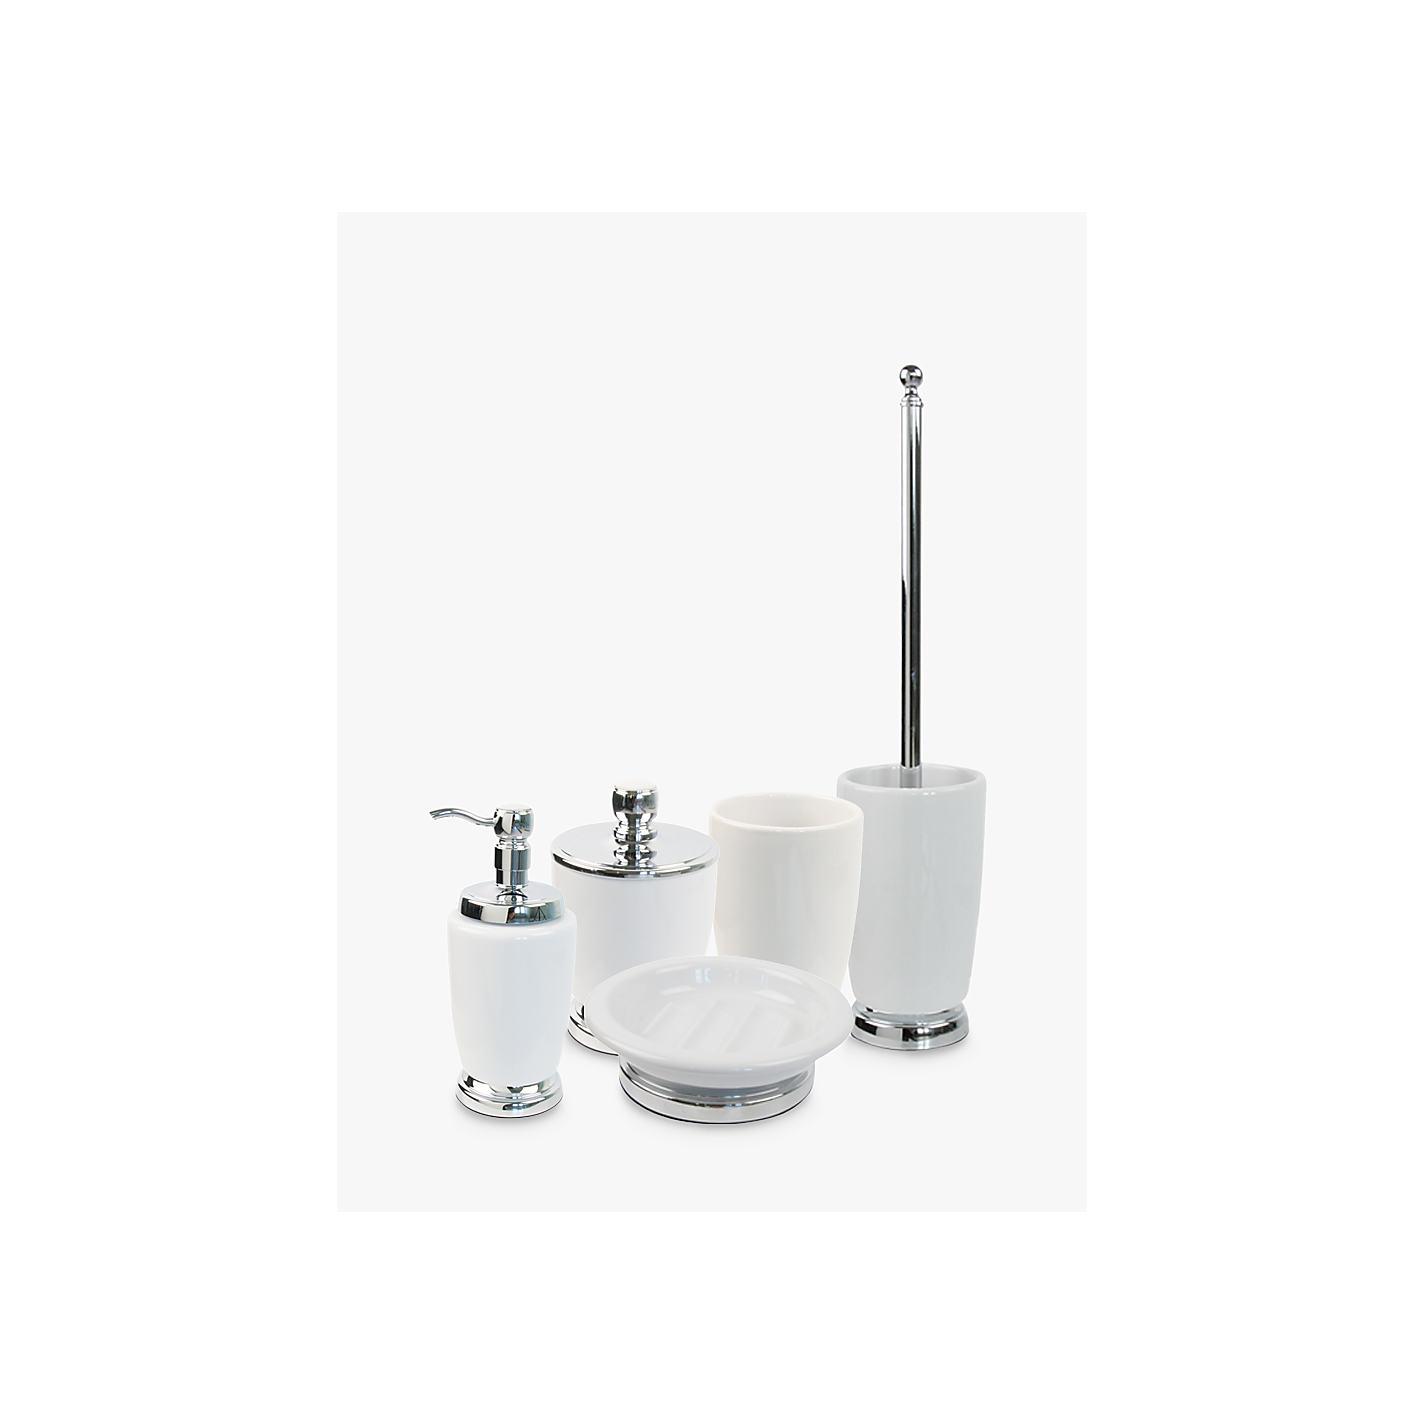 Miller bathroom fittings - Buy Miller Premium Bathroom Accessories Online At Johnlewis Com